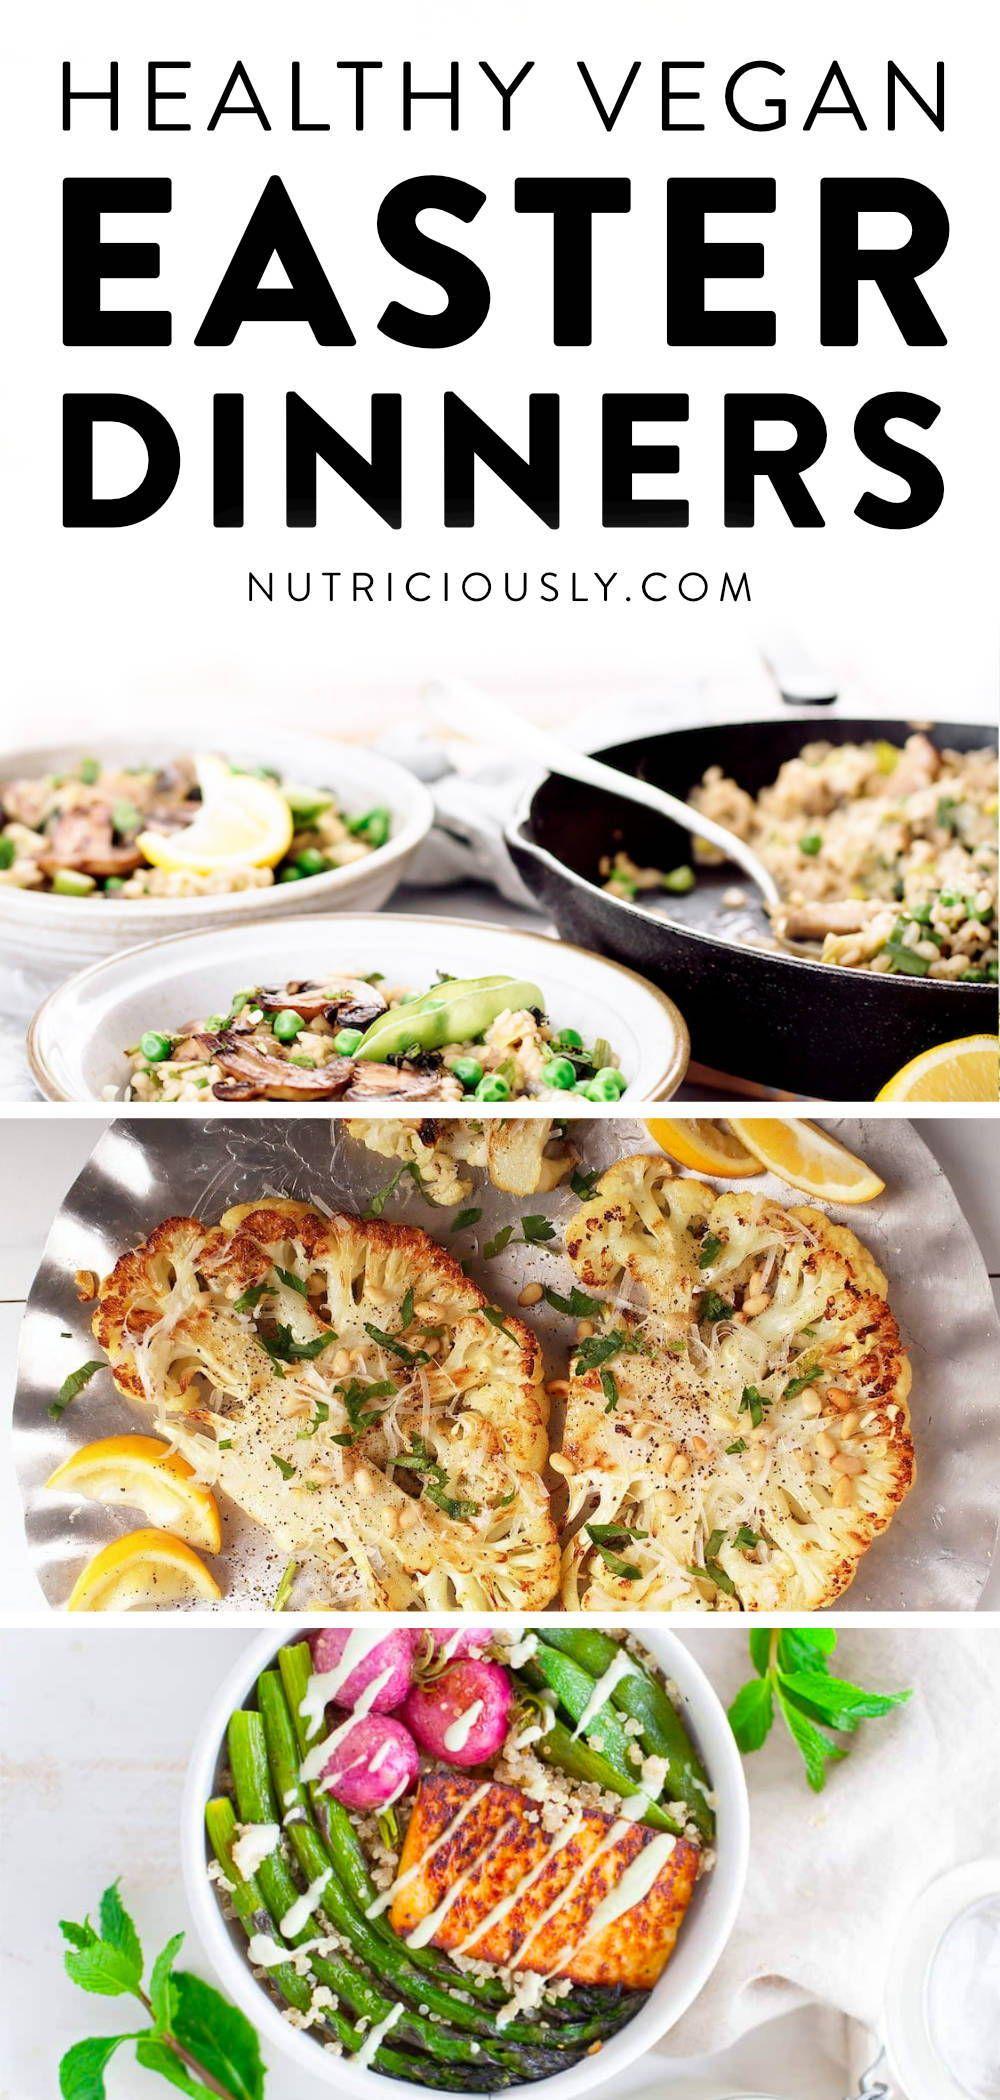 46 Healthy Vegan Easter Recipes Breakfast To Dinner In 2020 Easter Dinner Recipes Vegan Recipes Easy Vegan Easter Dinner